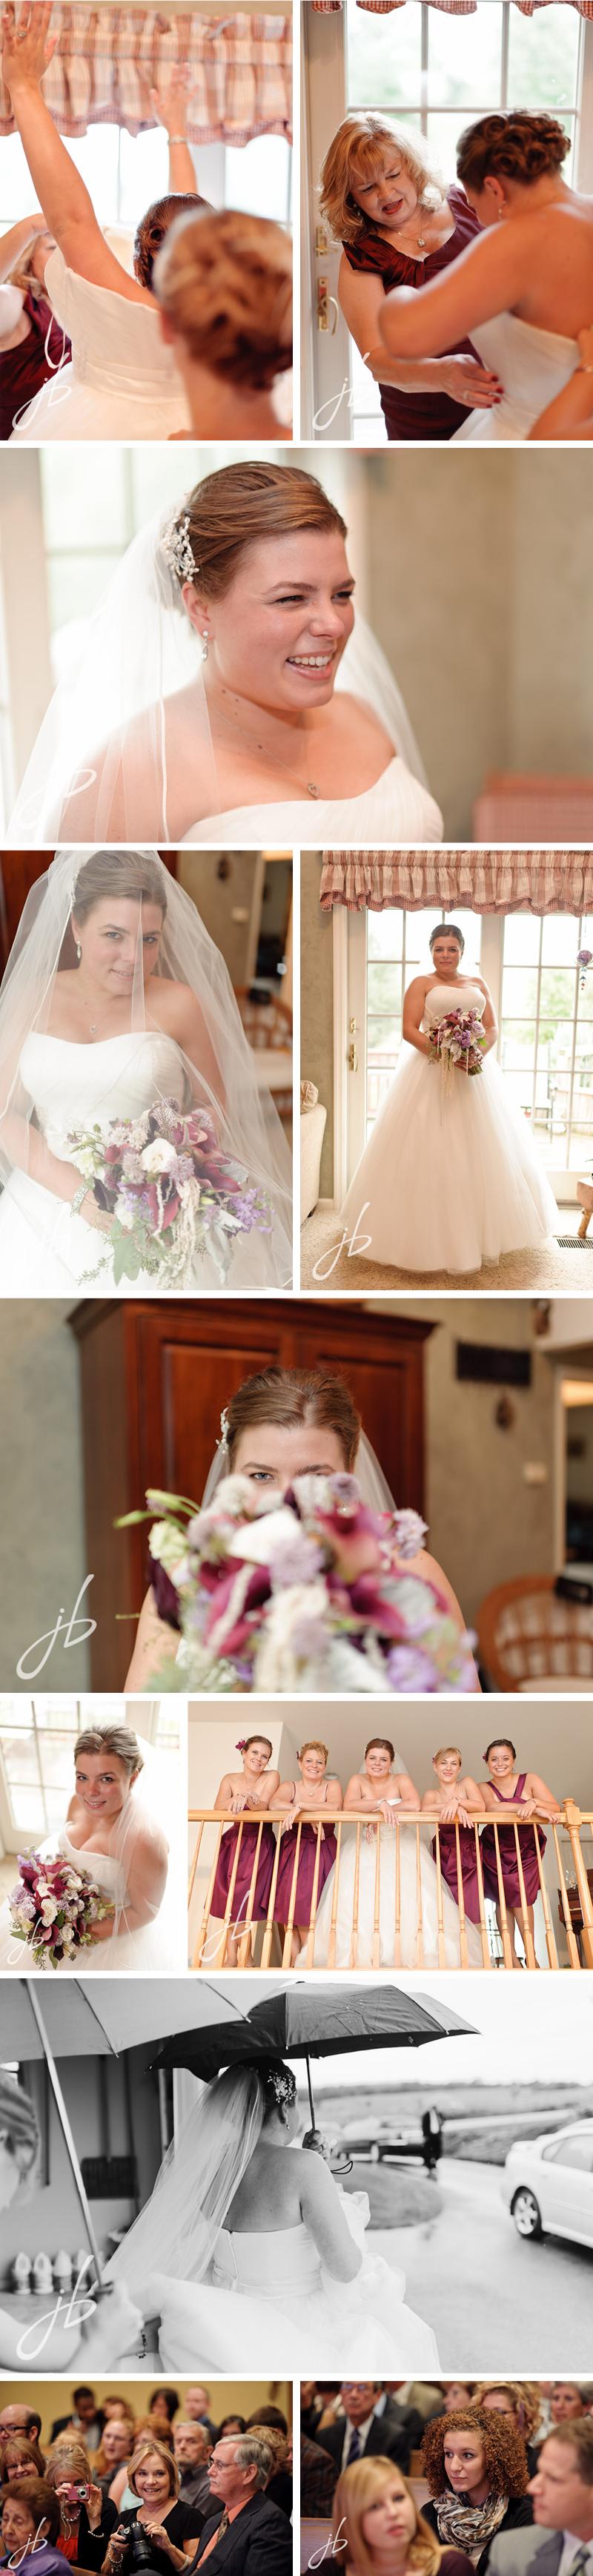 Millersville University wedding photography by Jeremy Bischoff Photography